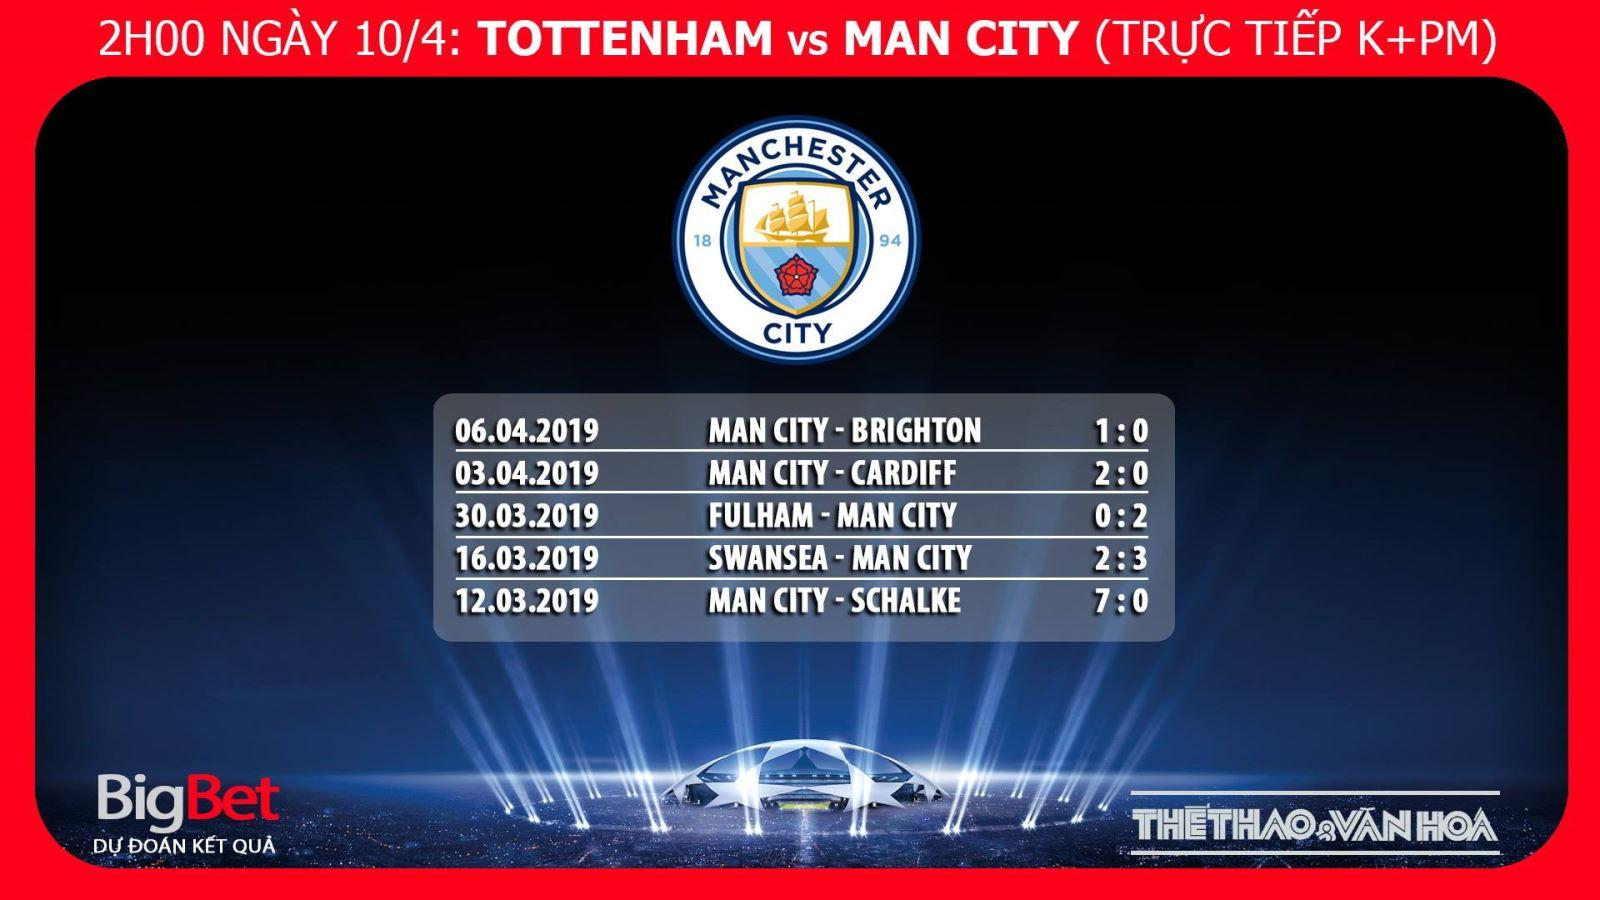 Trực tiếp Tottenham vs Man City, xem trực tiếp Tottenham vs Man City, trực tiếp bóng đá Tottenham vs Man City, truc tiep Tottenham vs Man City, xem truc tiep Tottenham vs Man City o dau?